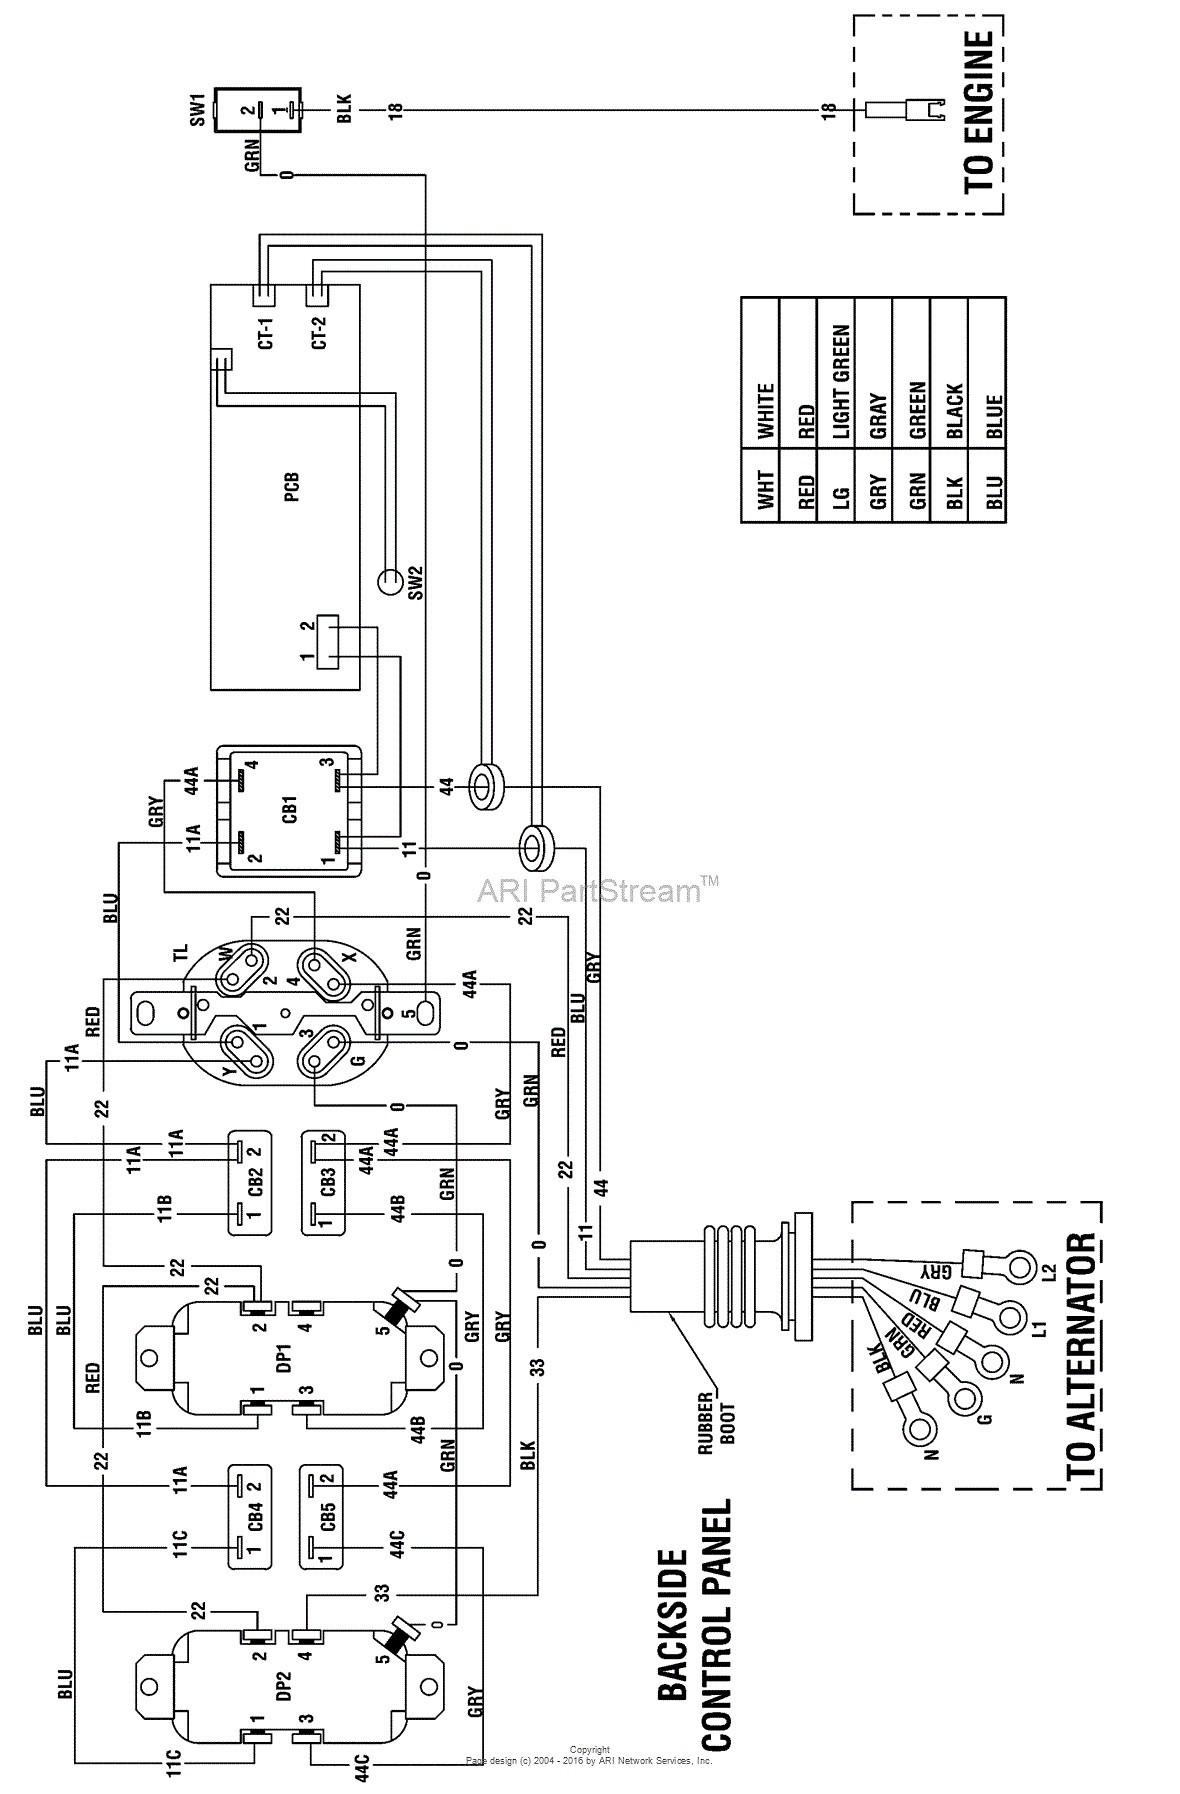 Briggs And Stratton Wiring Diagram Health Shop Me Endearing Enchanting 20 Briggs And Stratton Wiring Diagram 18 Hp